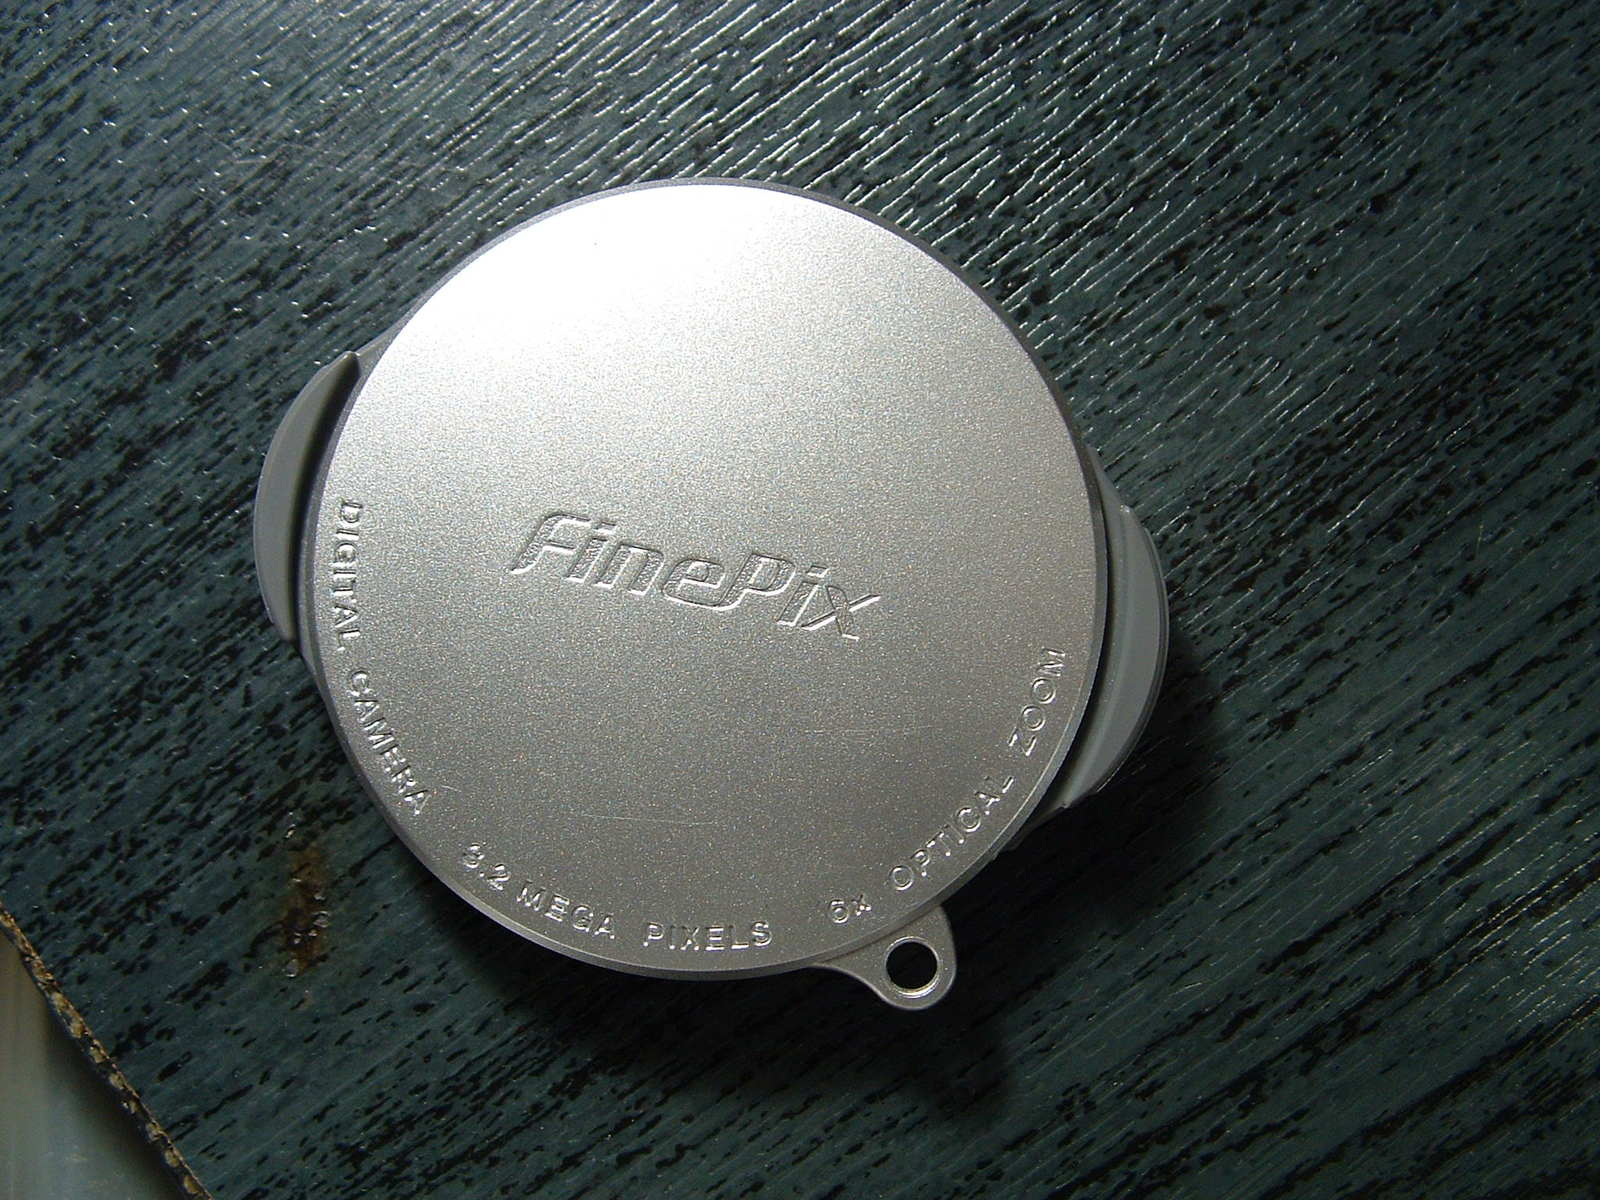 A camera cover